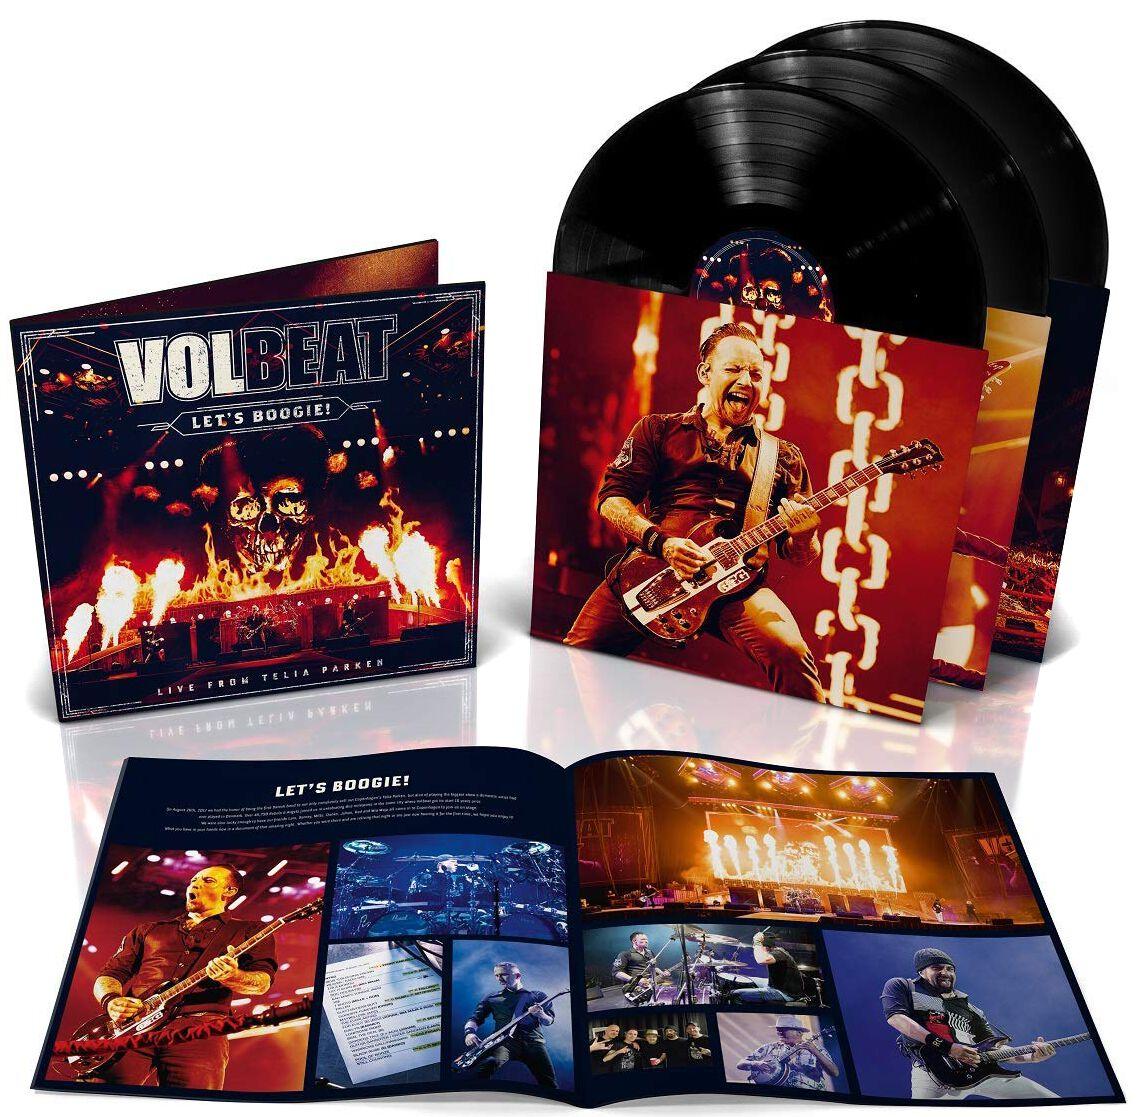 Image of   Volbeat Let's Boogie (Live from Telia Parken) 3-LP standard